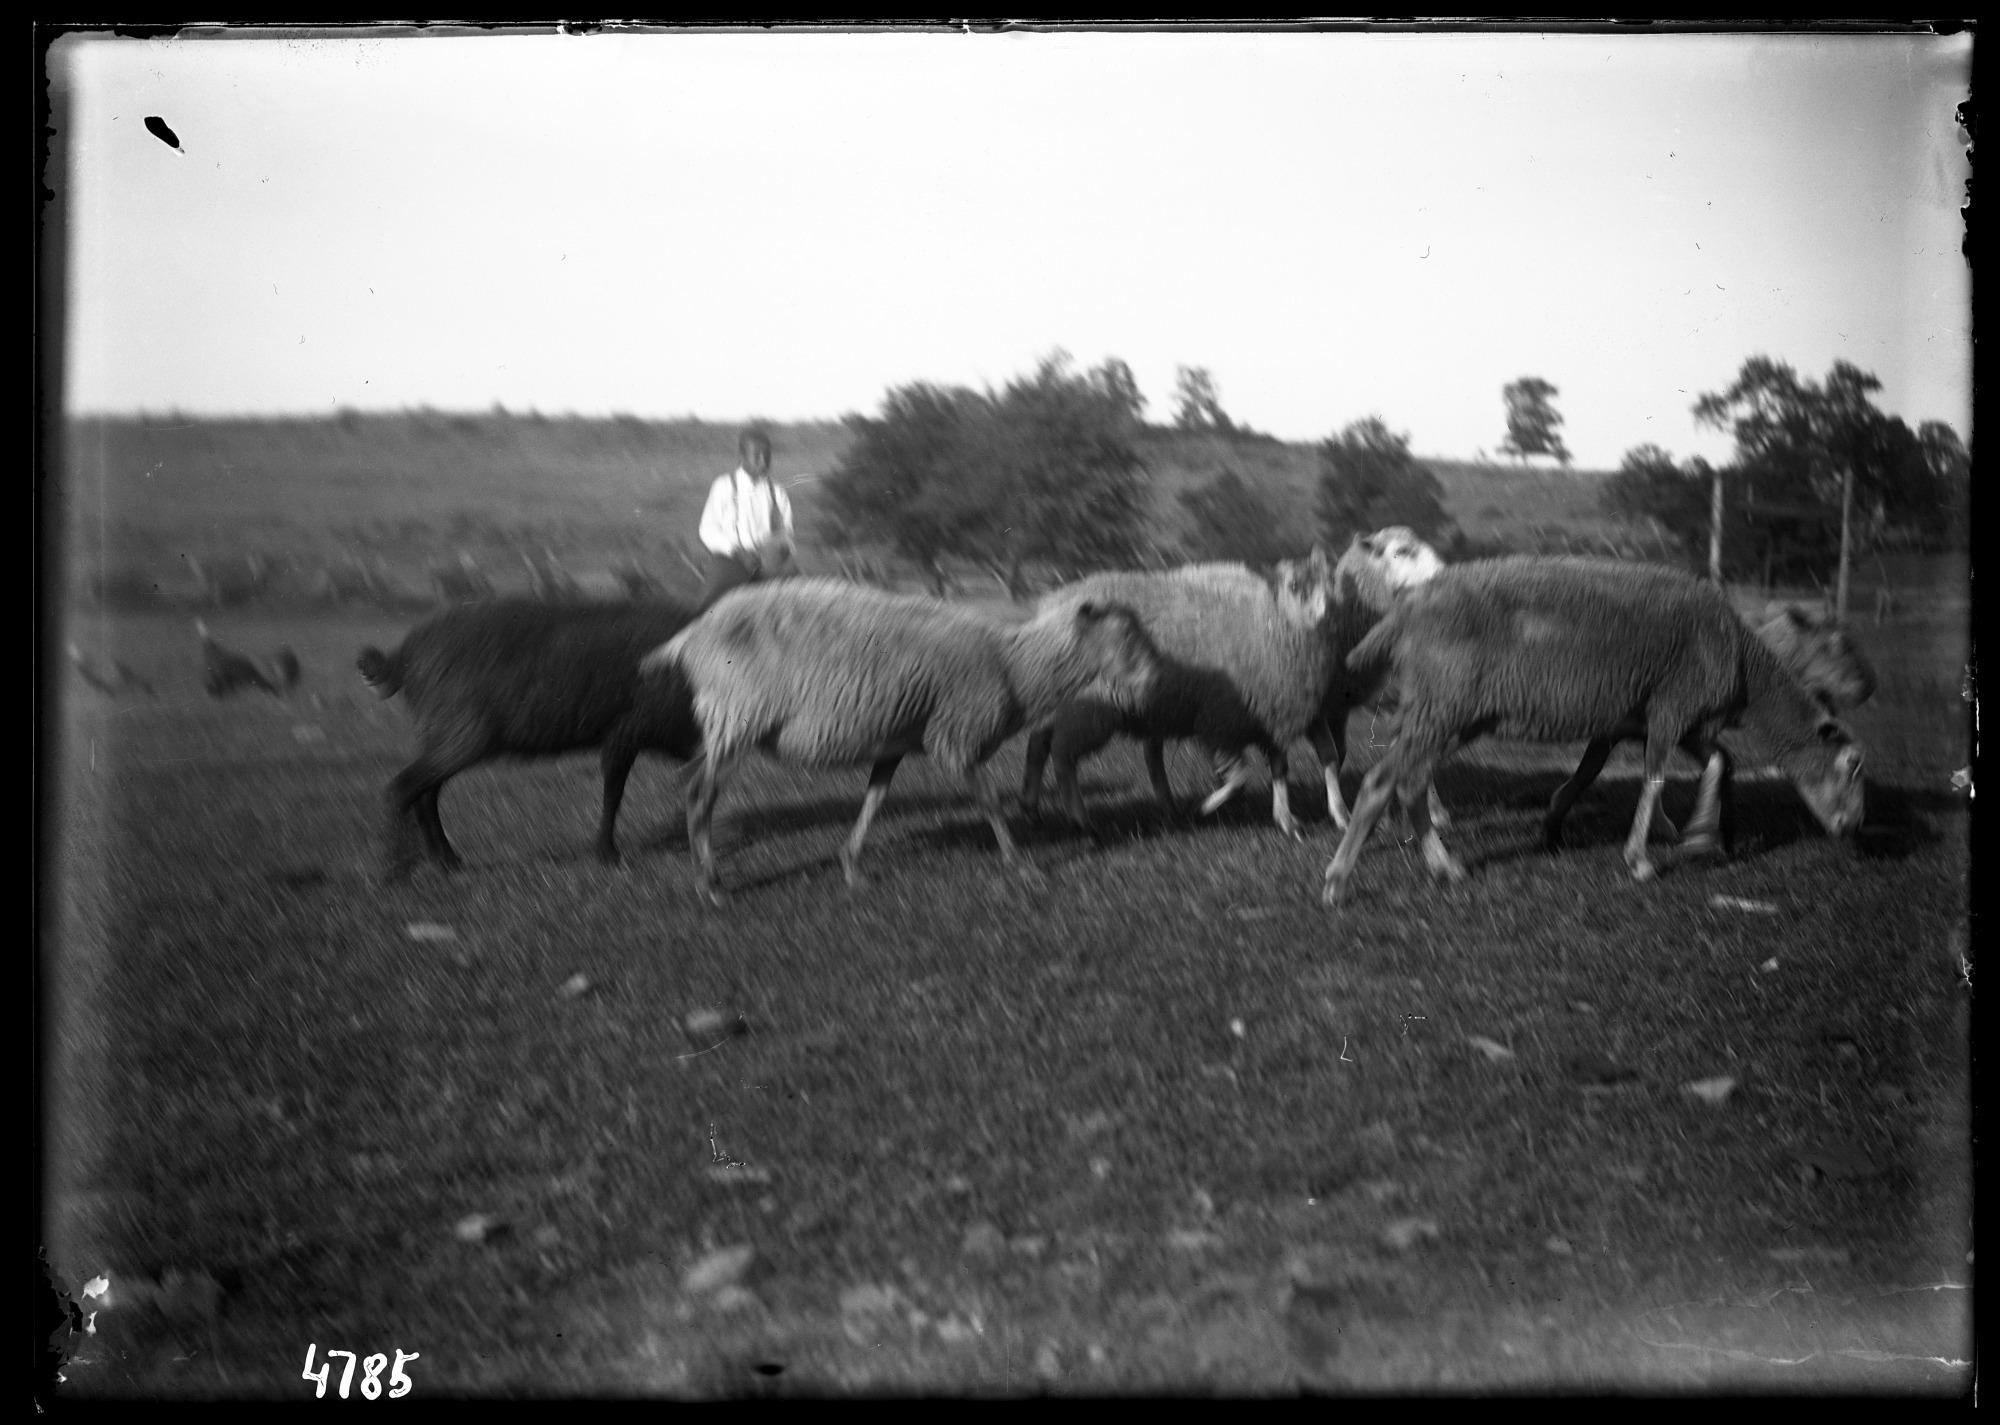 Unidentified Farm, 1880, Smithsonian Institution Archives, SIA Acc. 11-006 [MAH-4785].